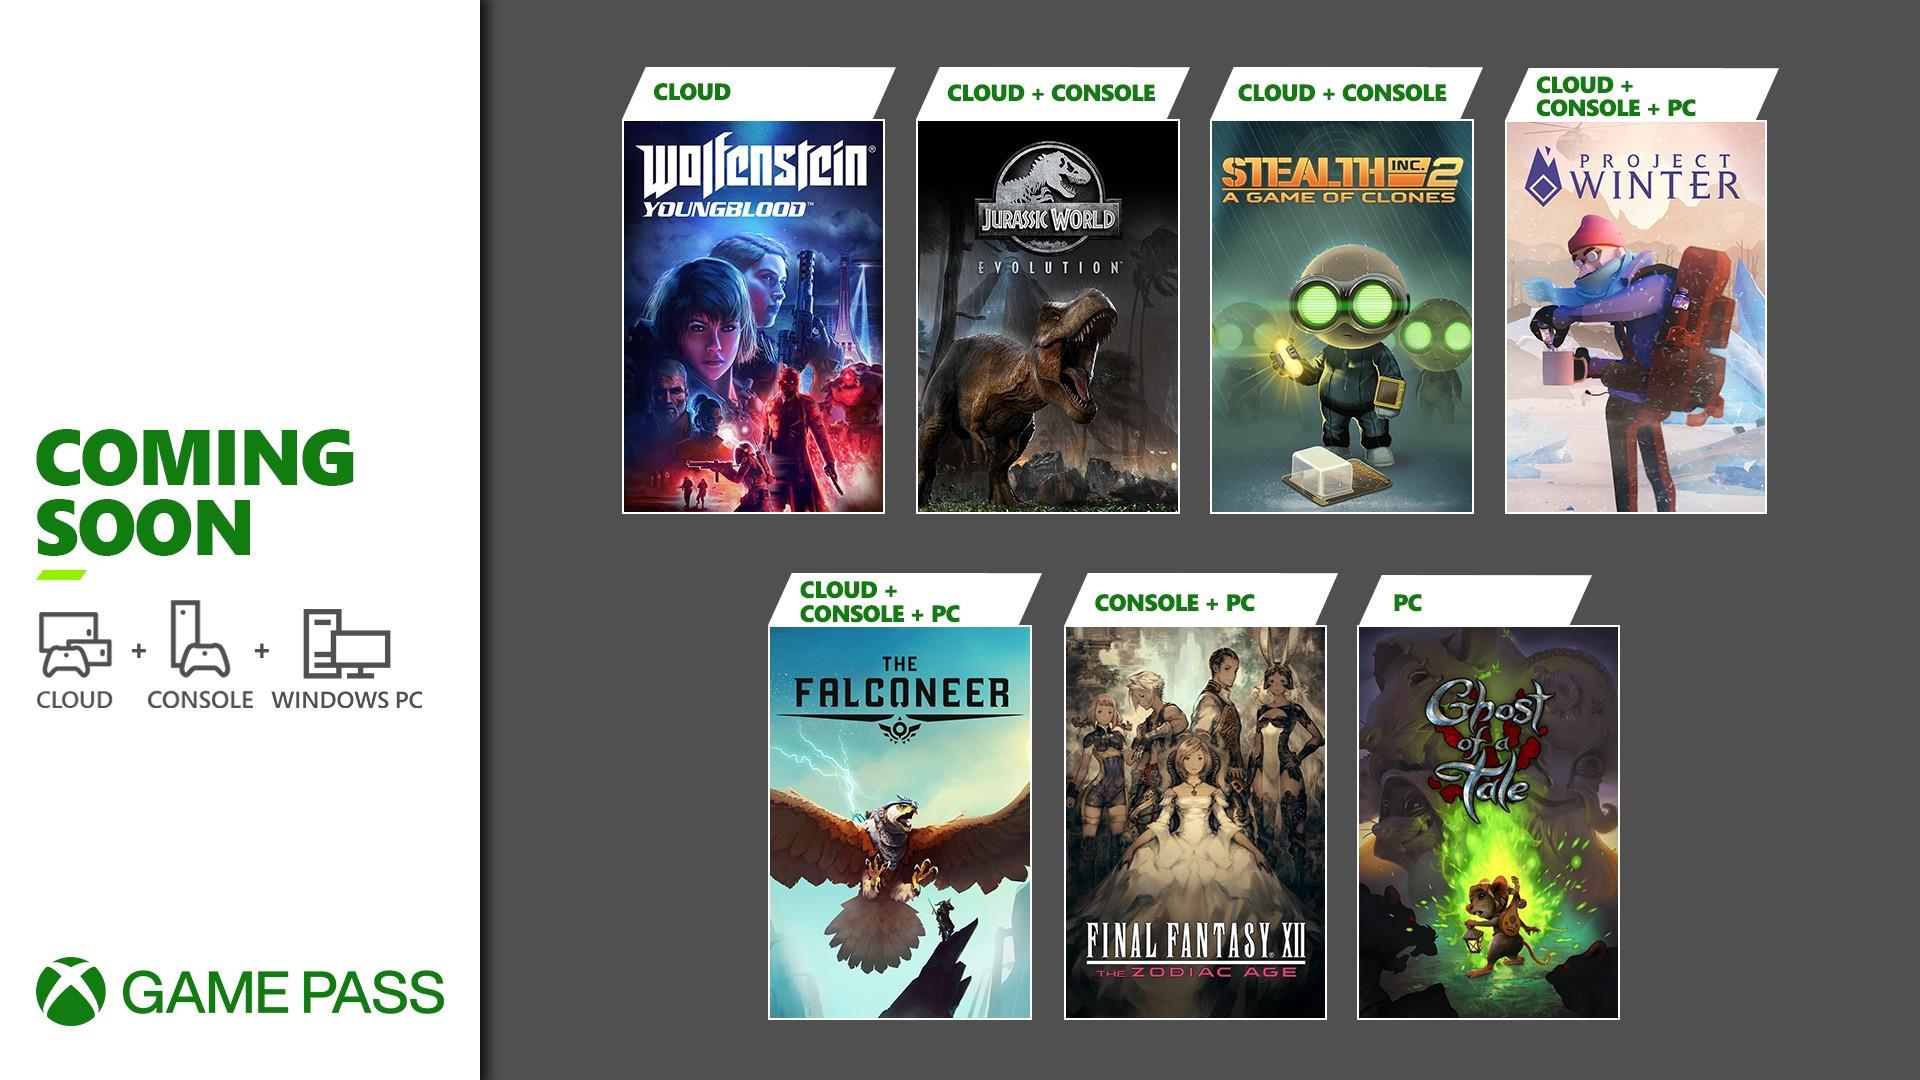 o.a. Wolfenstein Youngblood & Jurassic World Evolution naar Game Pass